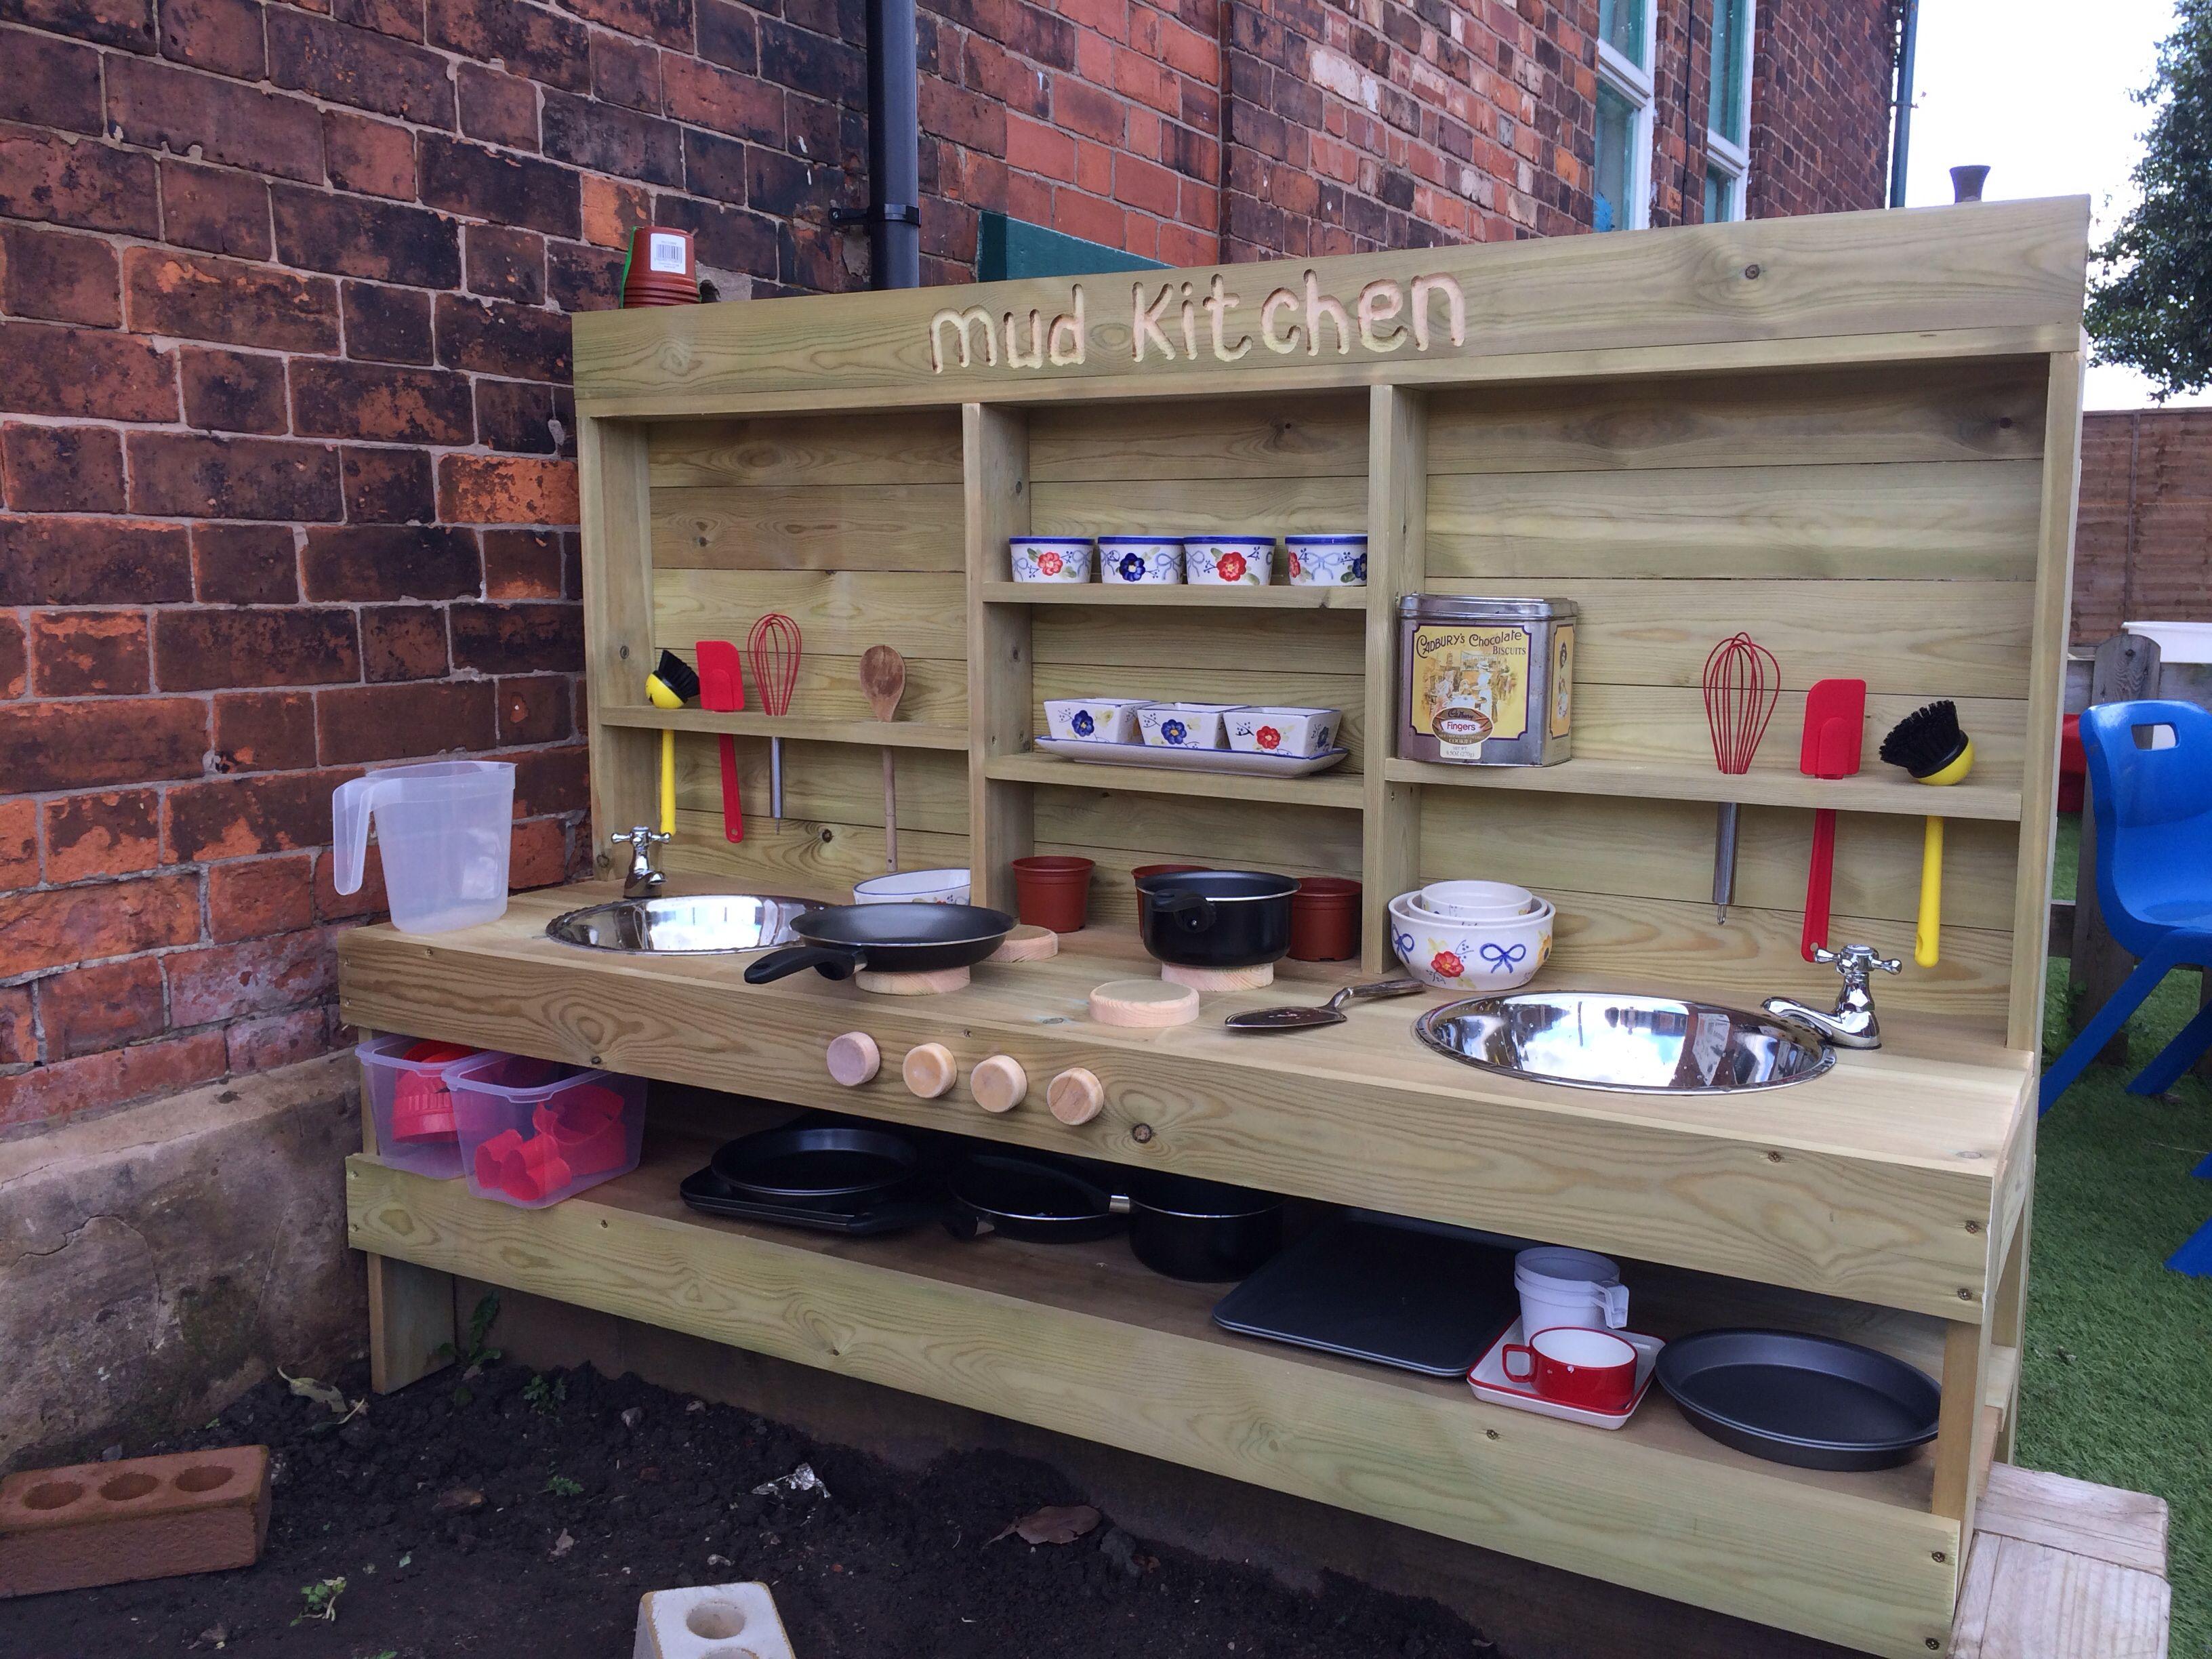 Fun ideas for outdoor mud kitchens for kids Mud kitchen